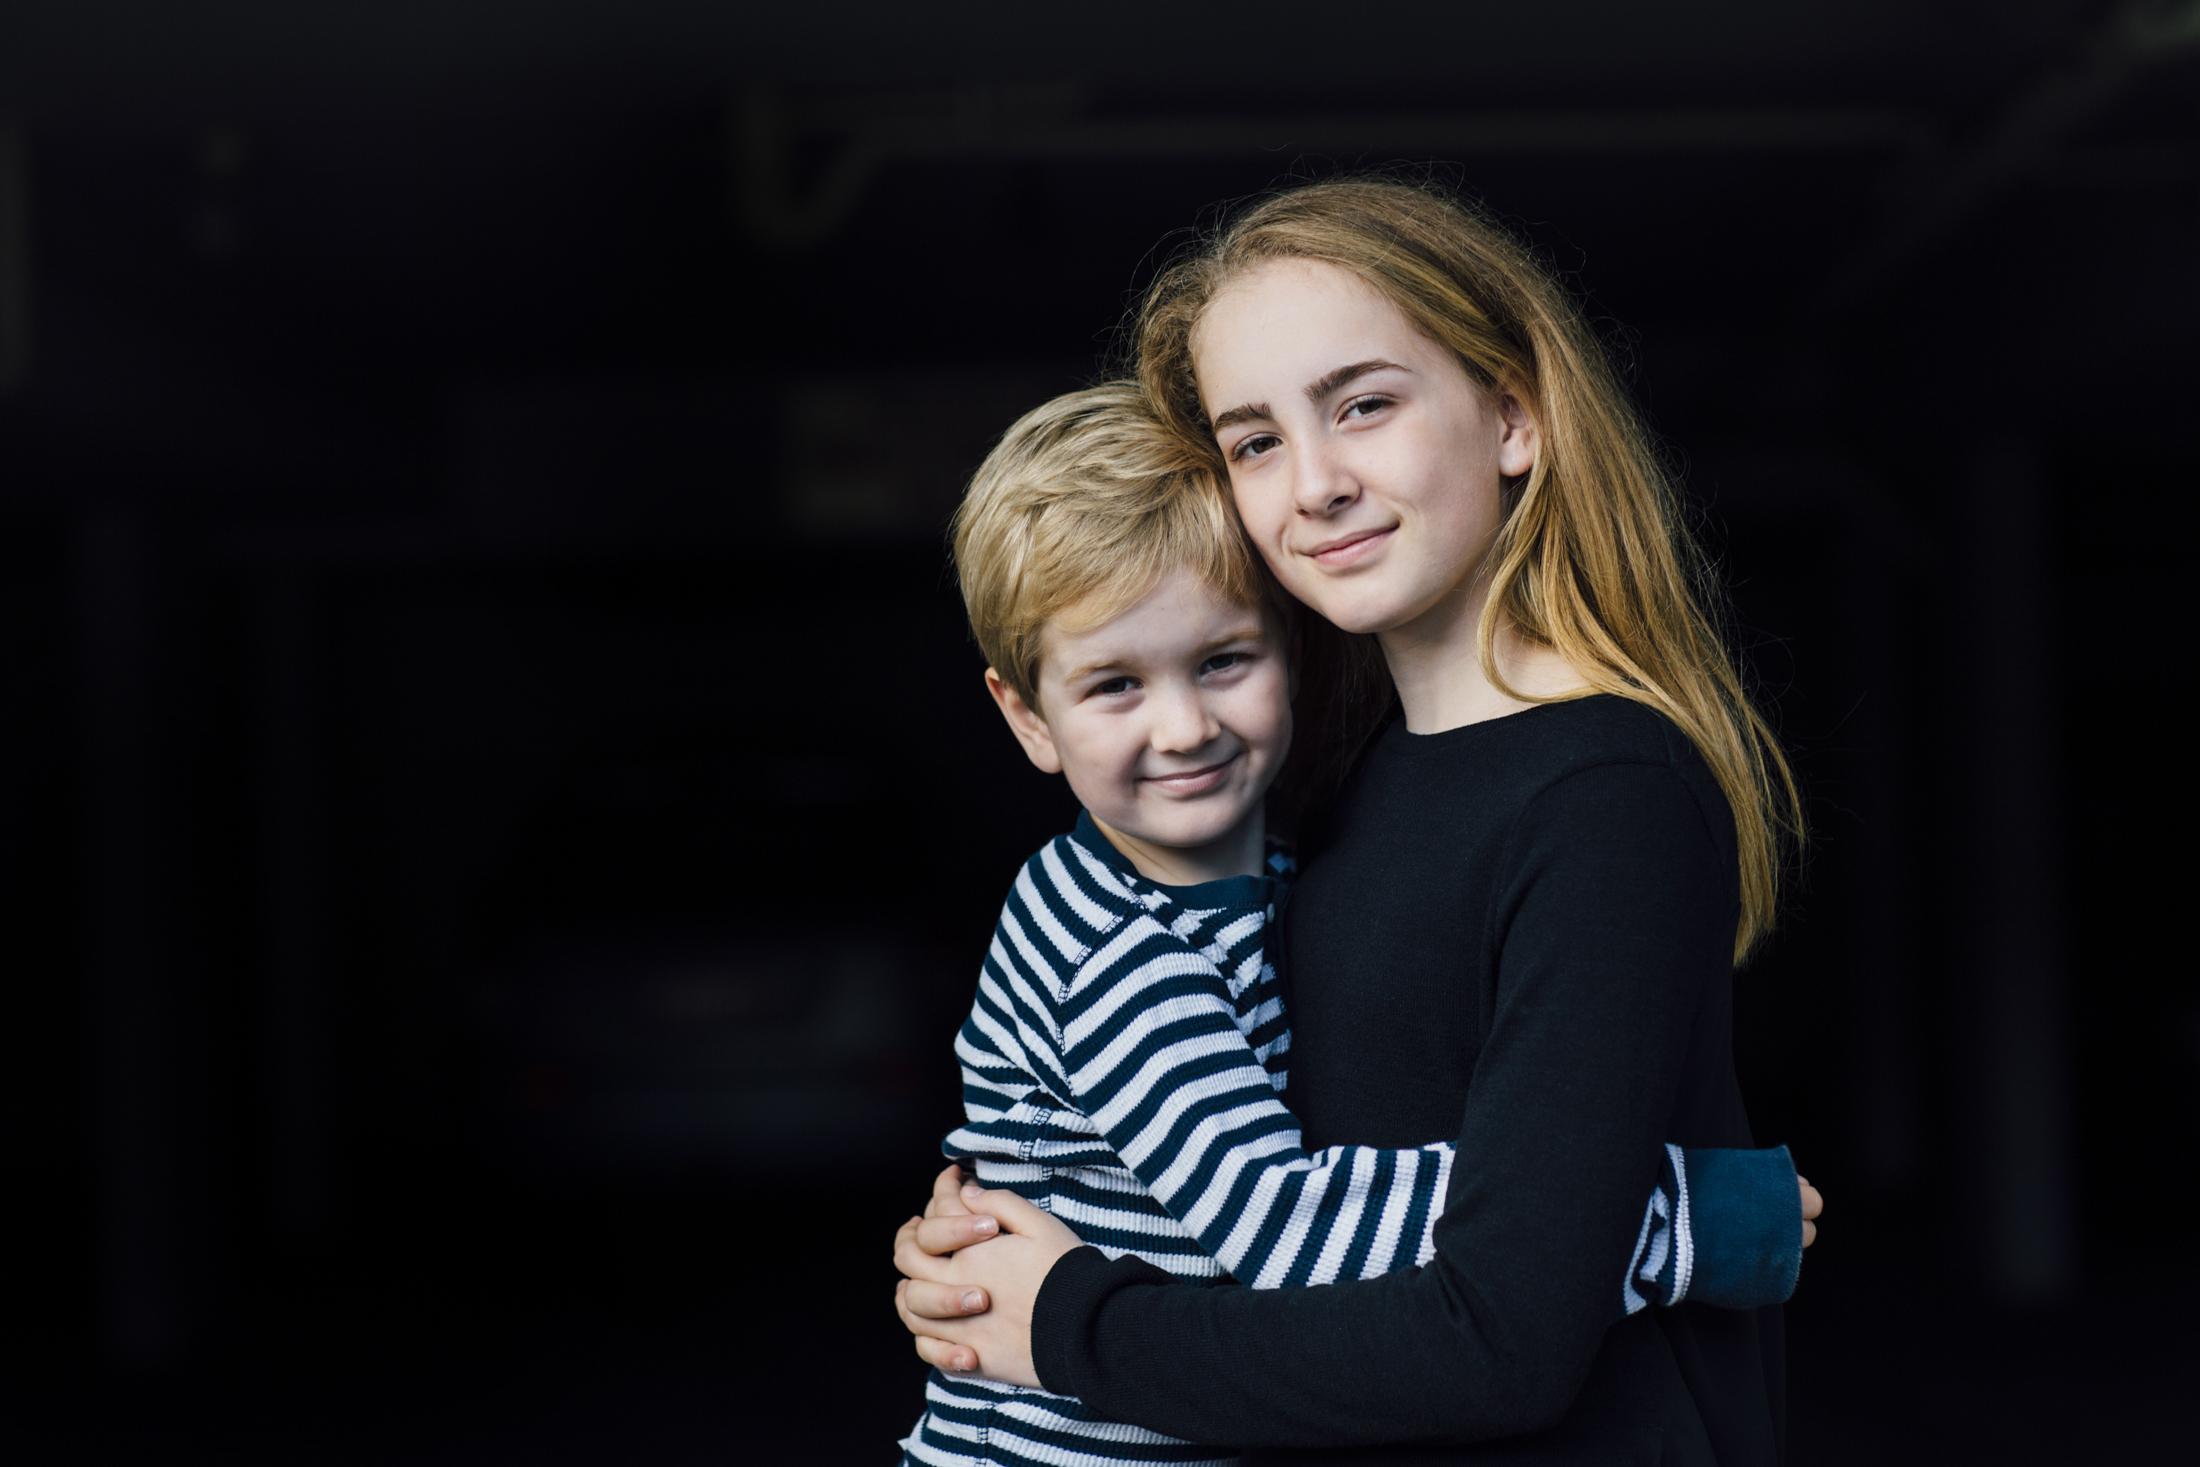 mark_taylor_sydney_family_photography_morffew-8.jpg